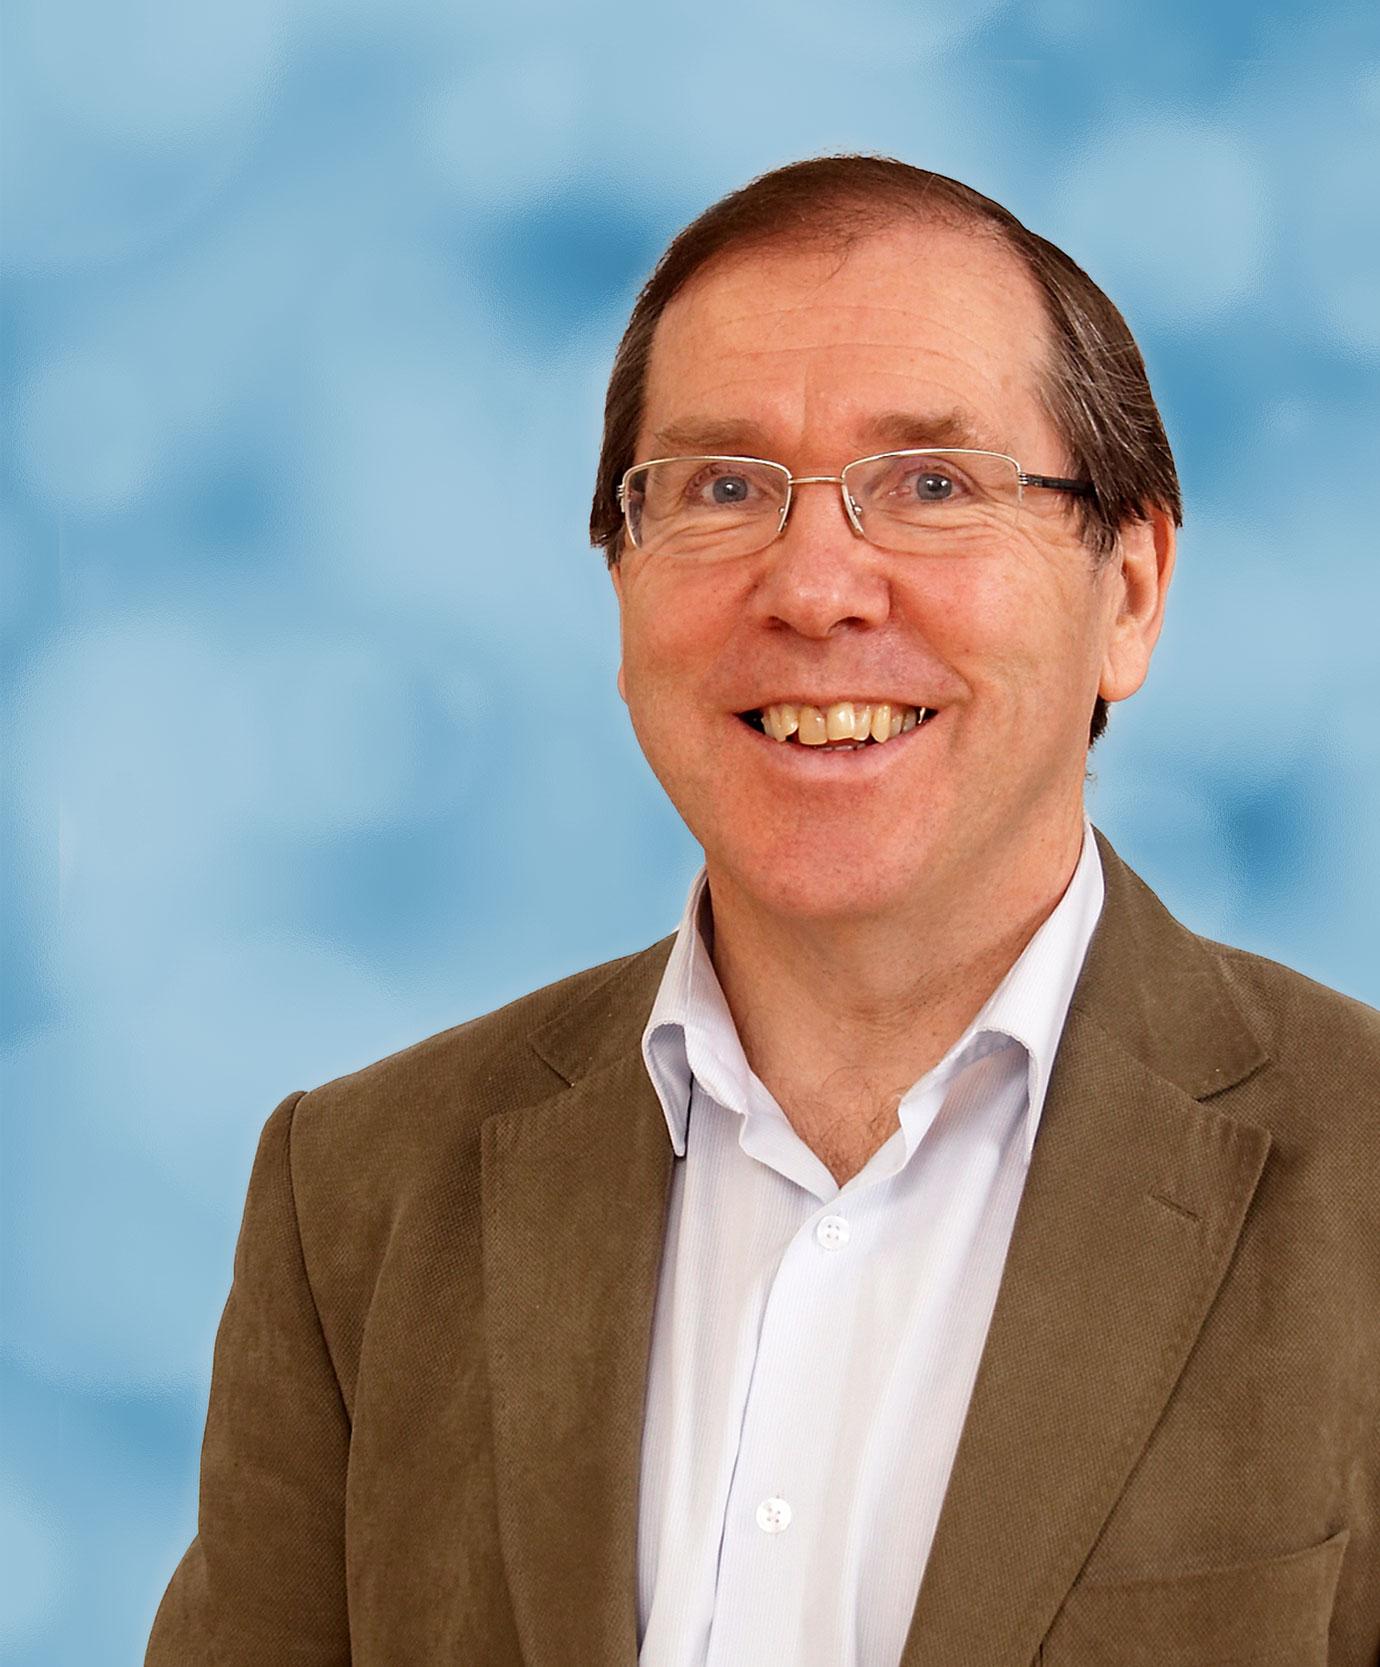 Bob Gomersall